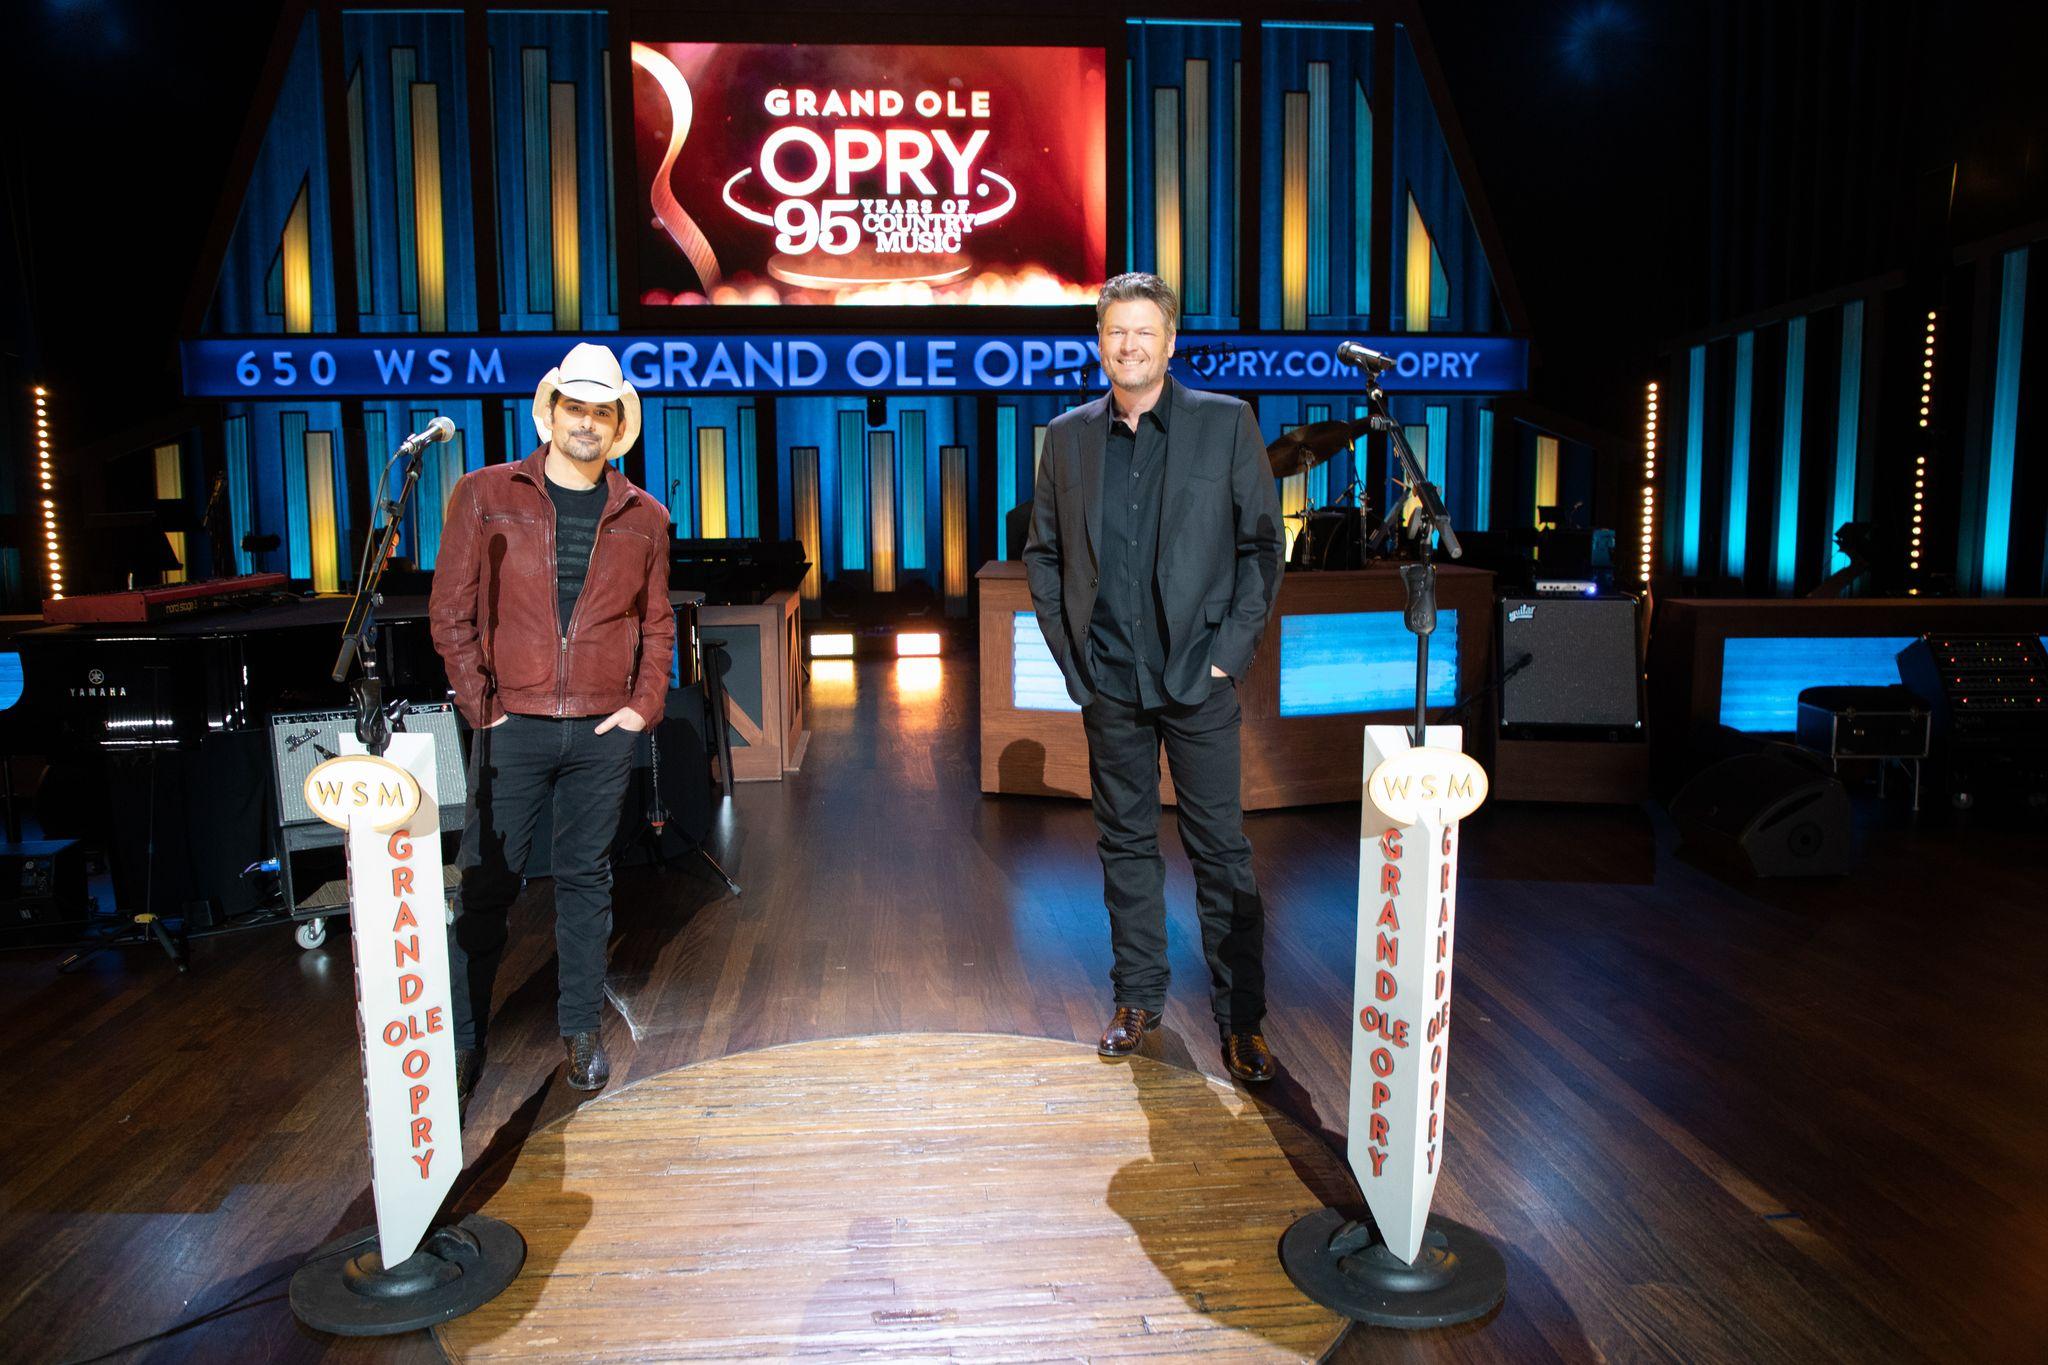 BRAD PAISLEY & BLAKE SHELTON TO HOST  'GRAND OLE OPRY: 95 YEARS OF COUNTRY MUSIC'  ON SUNDAY, FEB. 14 ON NBC